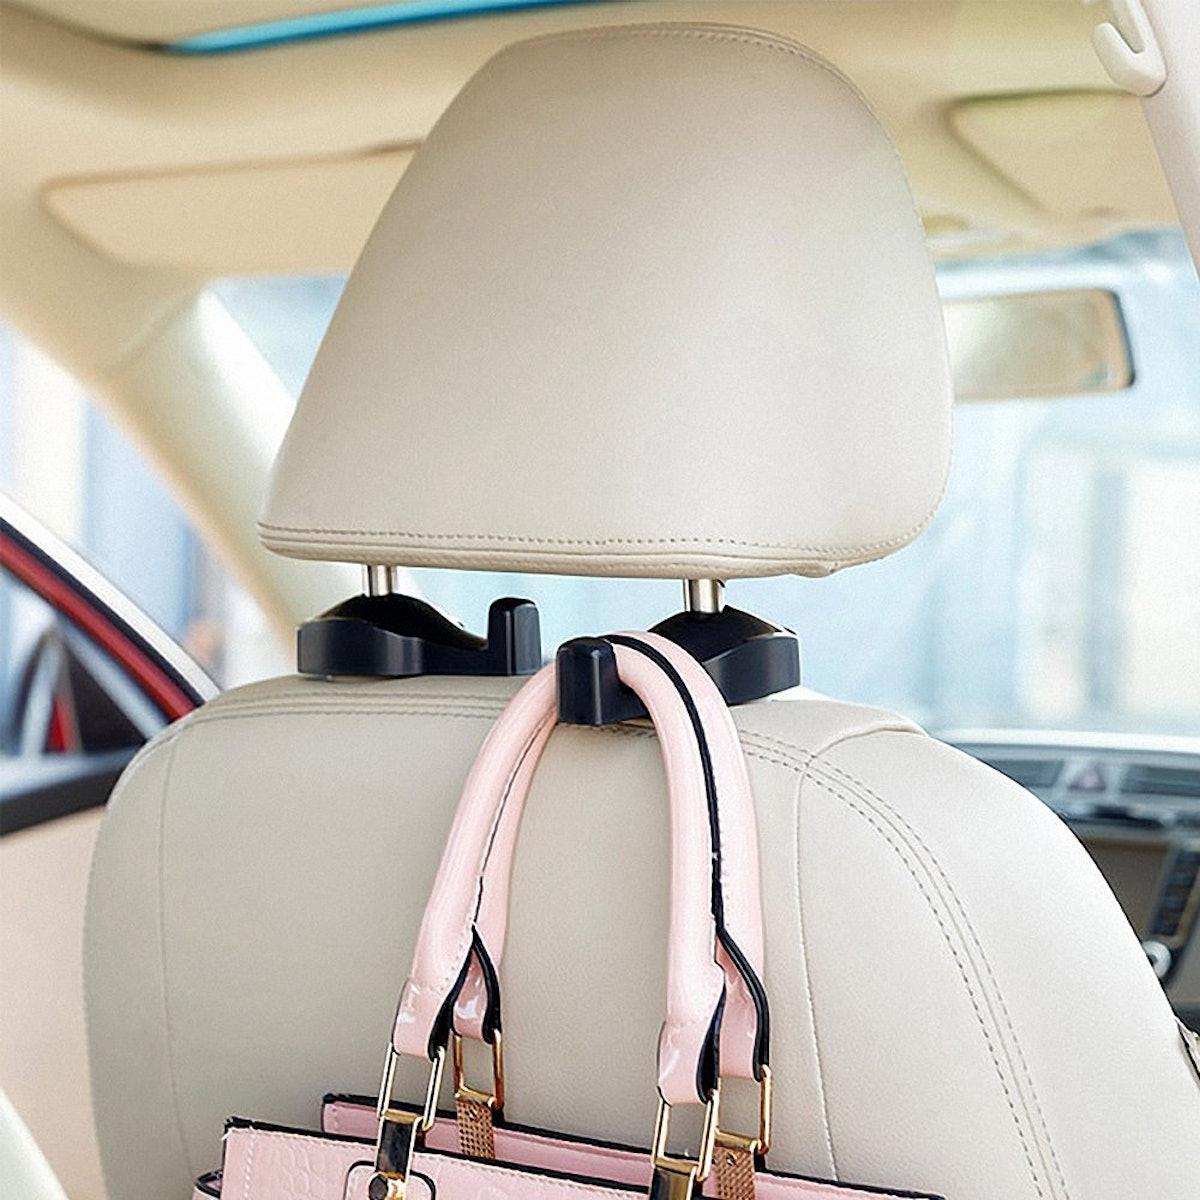 IPELY Car Purse Holder (2 Pack)